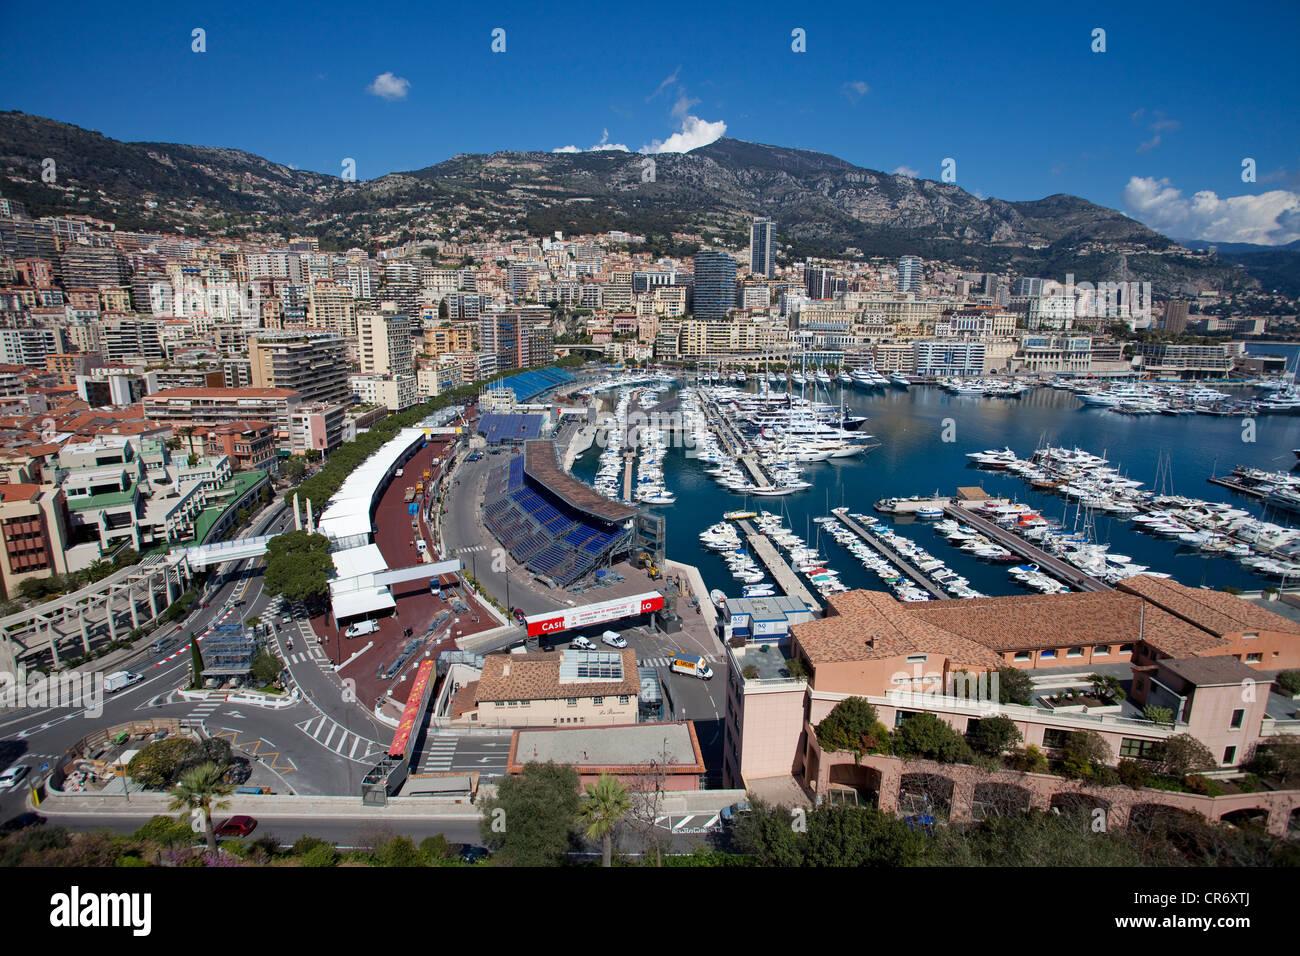 City and harbour of Monaco, Europa - Stock Image